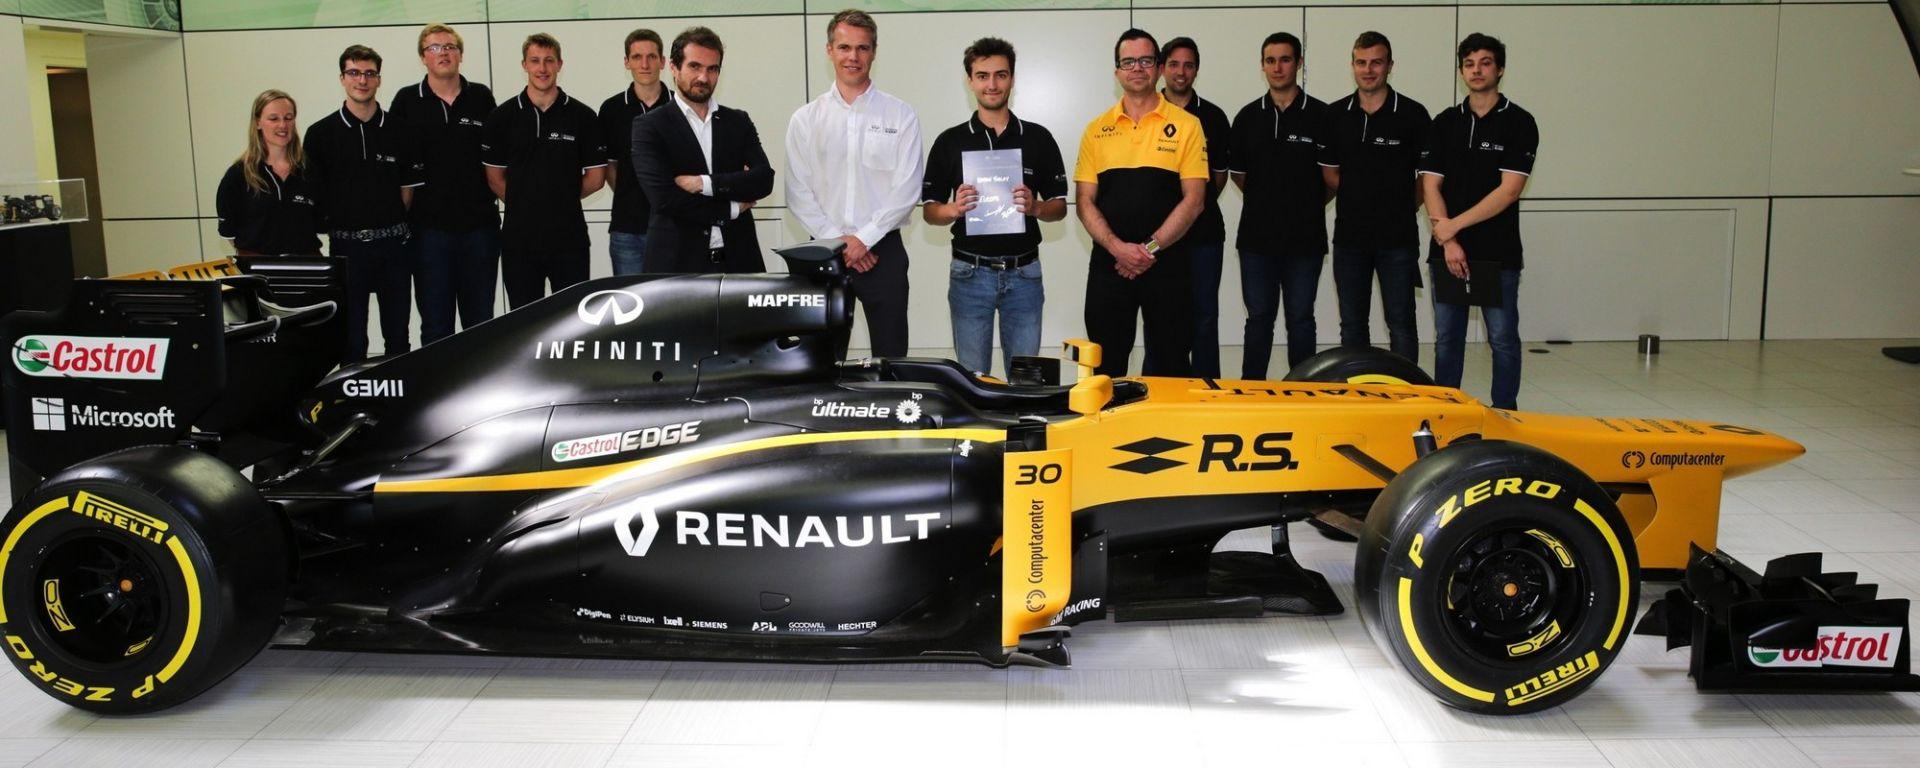 Infiniti Engineering Academy: proclamato il vincitore europeo